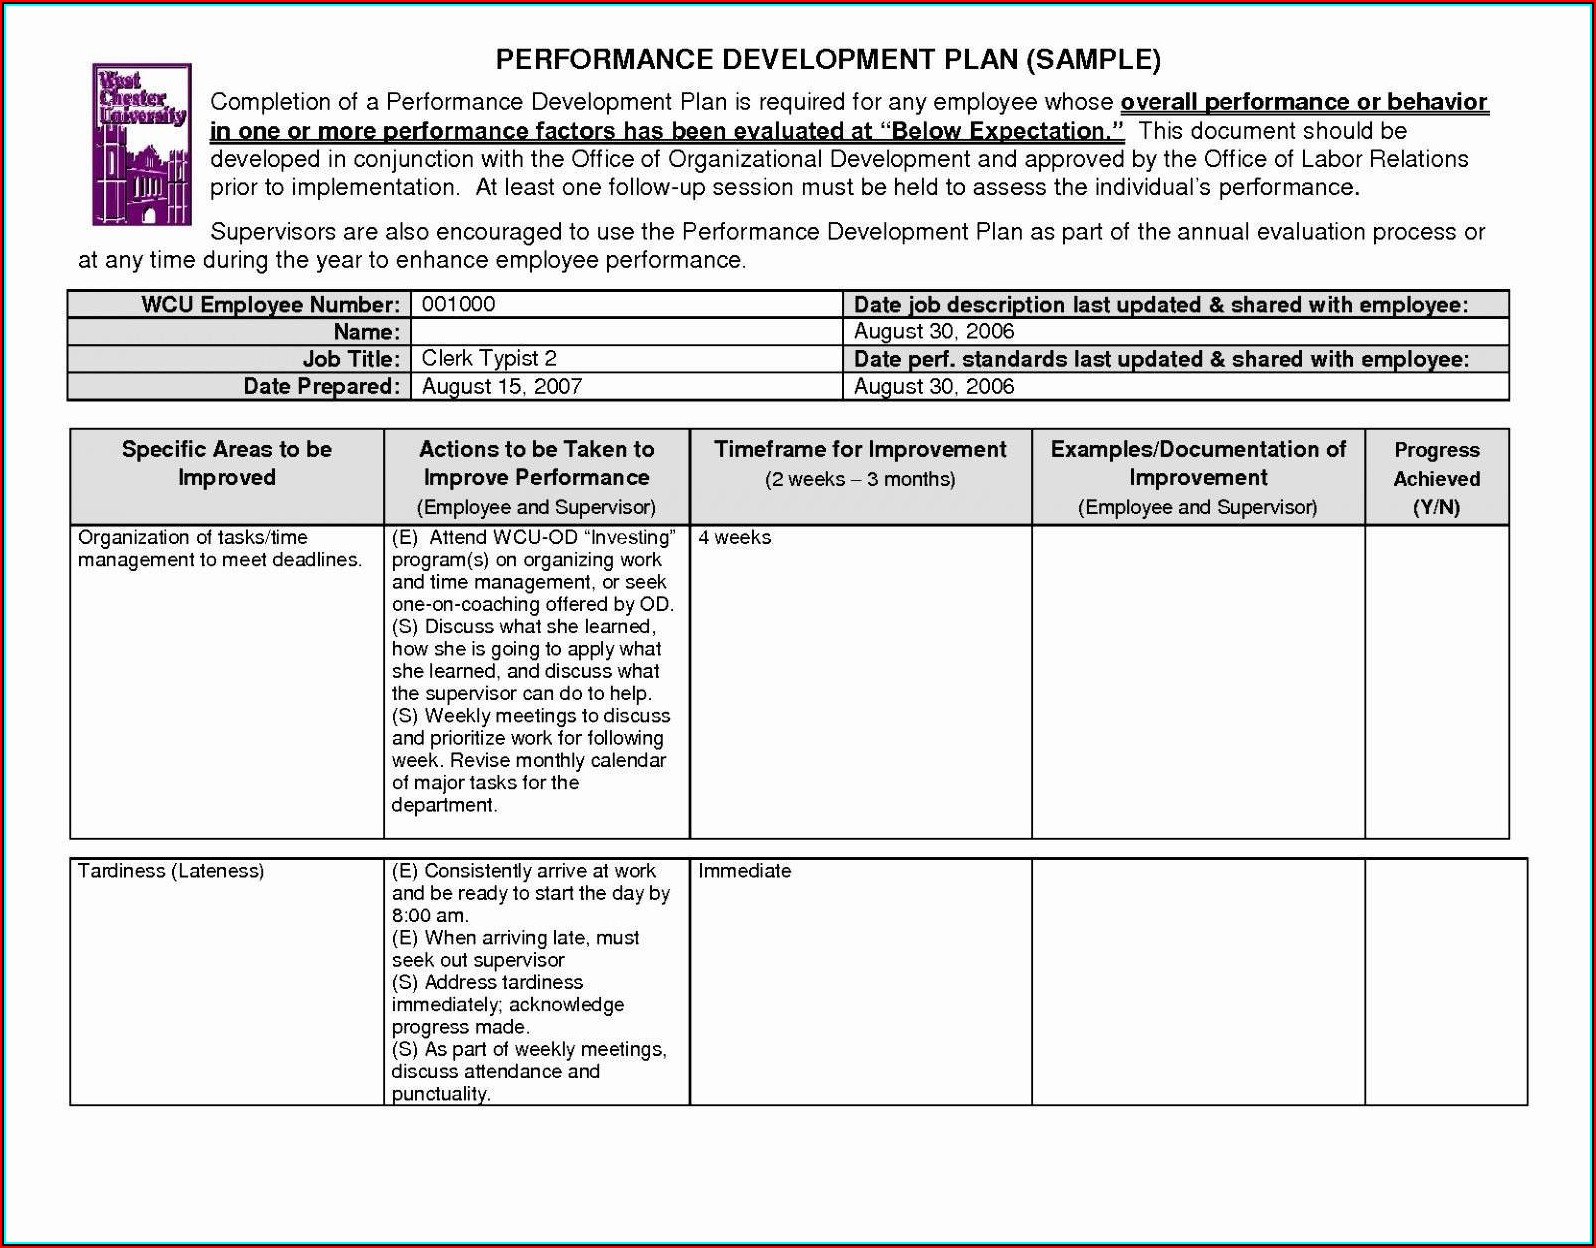 Cms Hcfa 1500 Form Instructions